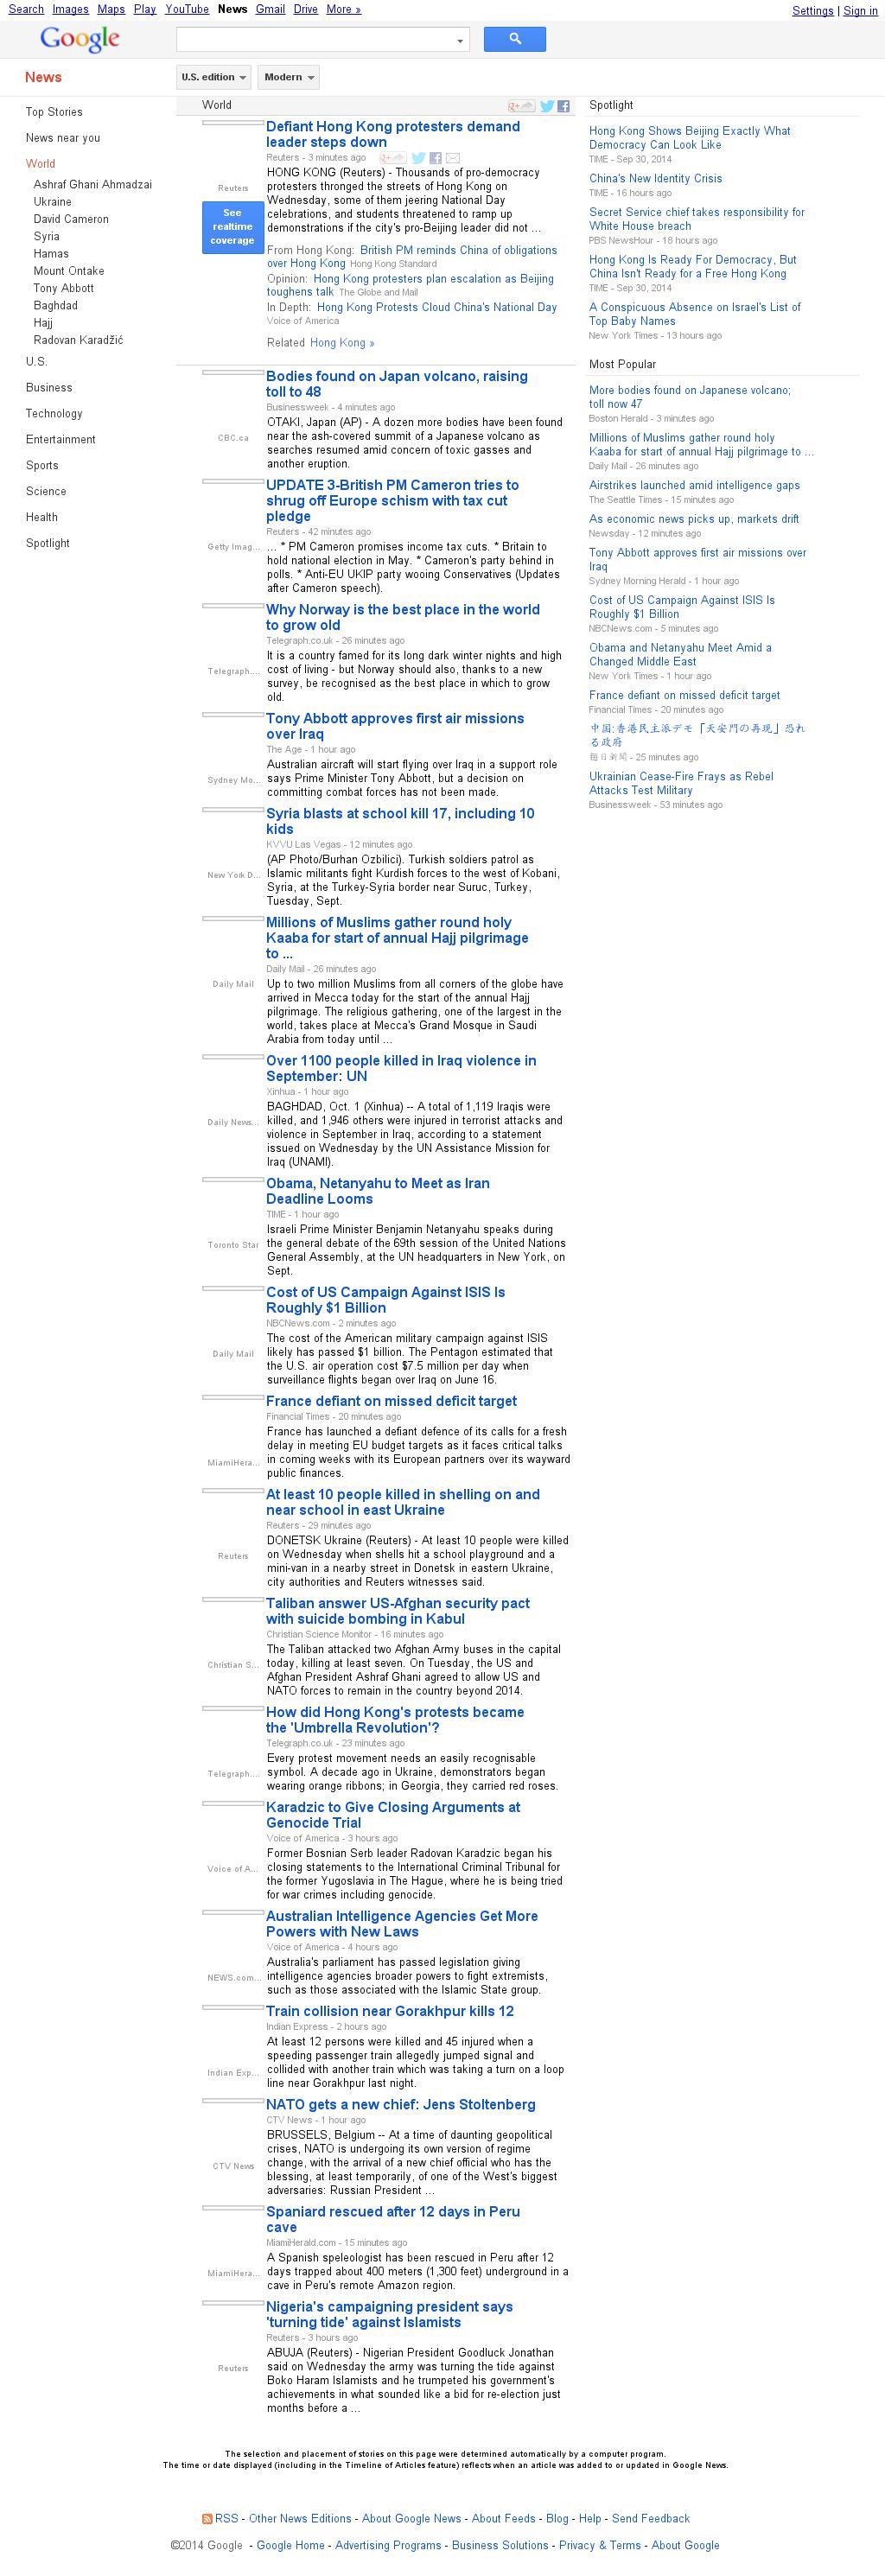 Google News: World at Wednesday Oct. 1, 2014, 1:07 p.m. UTC